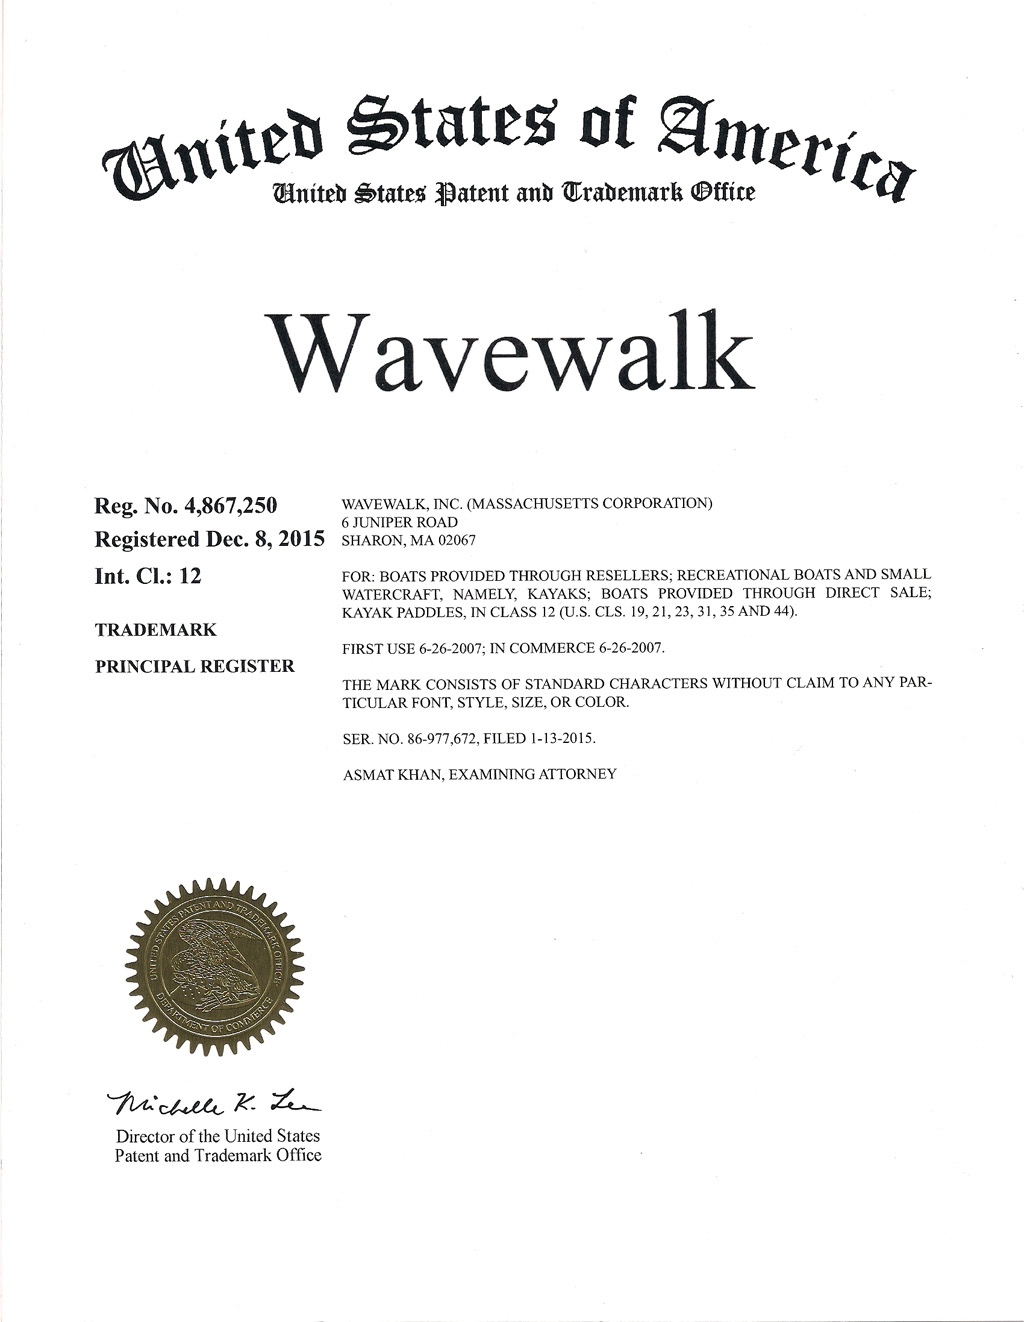 Wavewalk Trademark